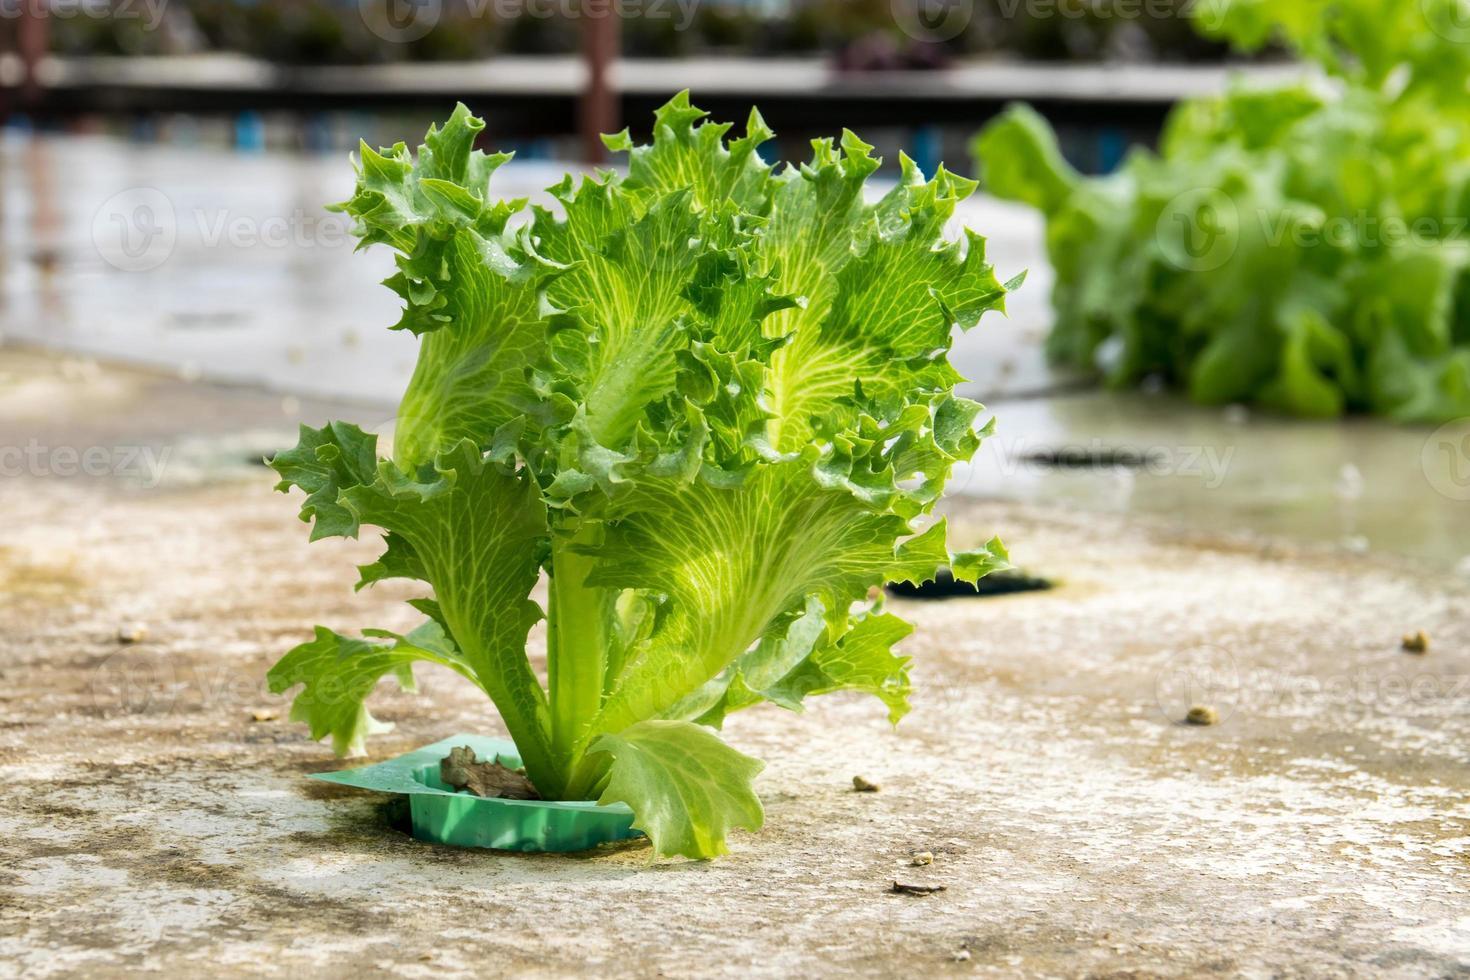 Anbau Hydrokultur grünes Gemüse in der Farm foto